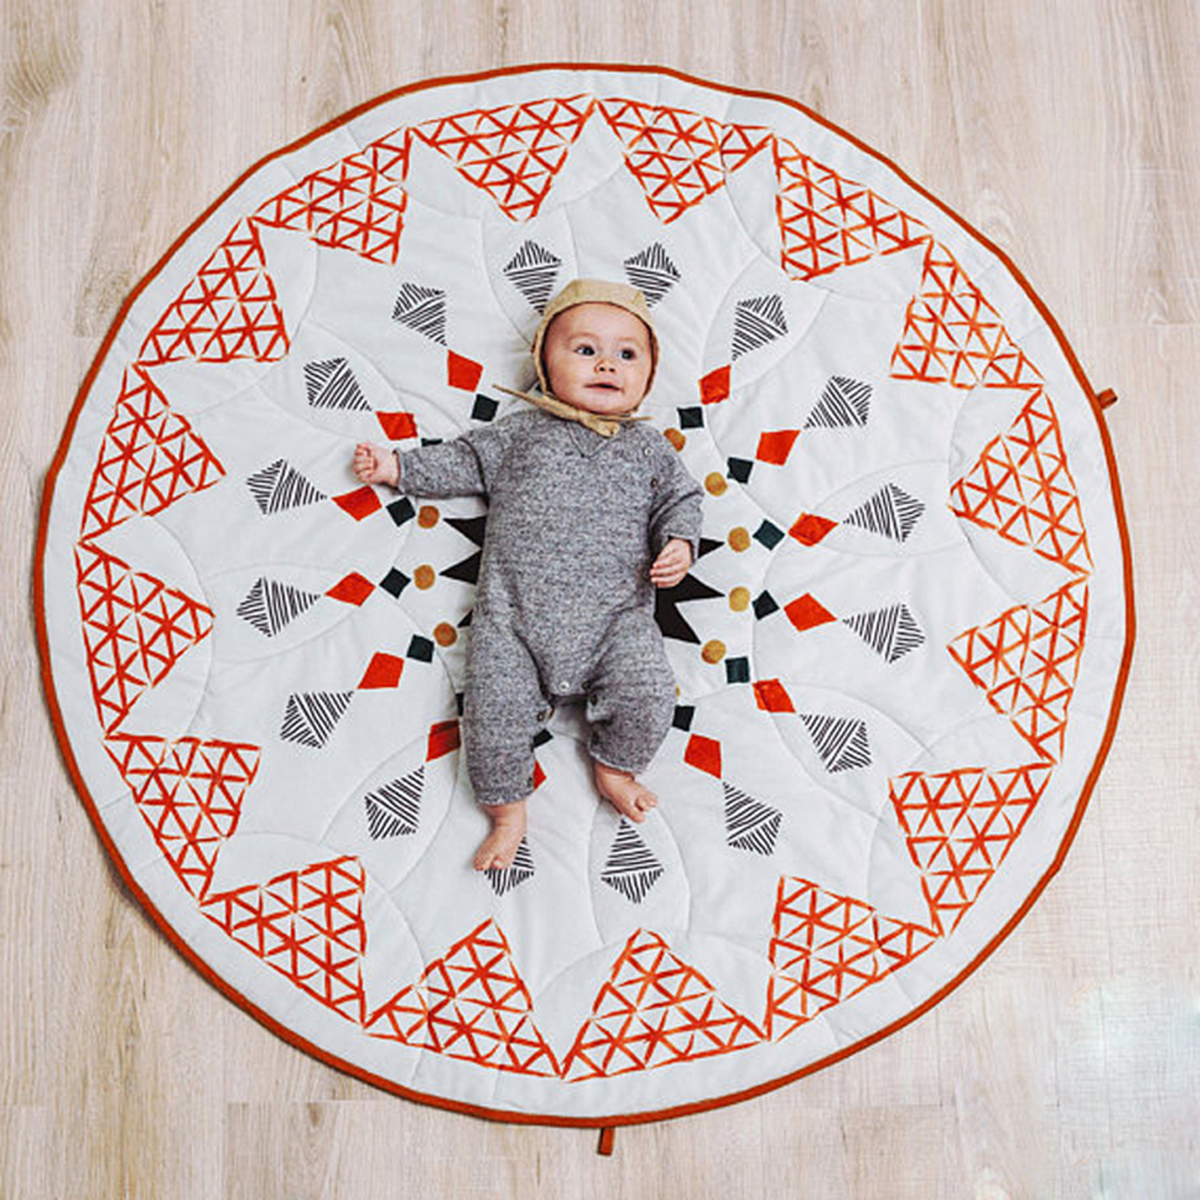 90cm Kids Play Mat Geometric Pattern Baby Crawling Pad Moroccan Style Floor Mat